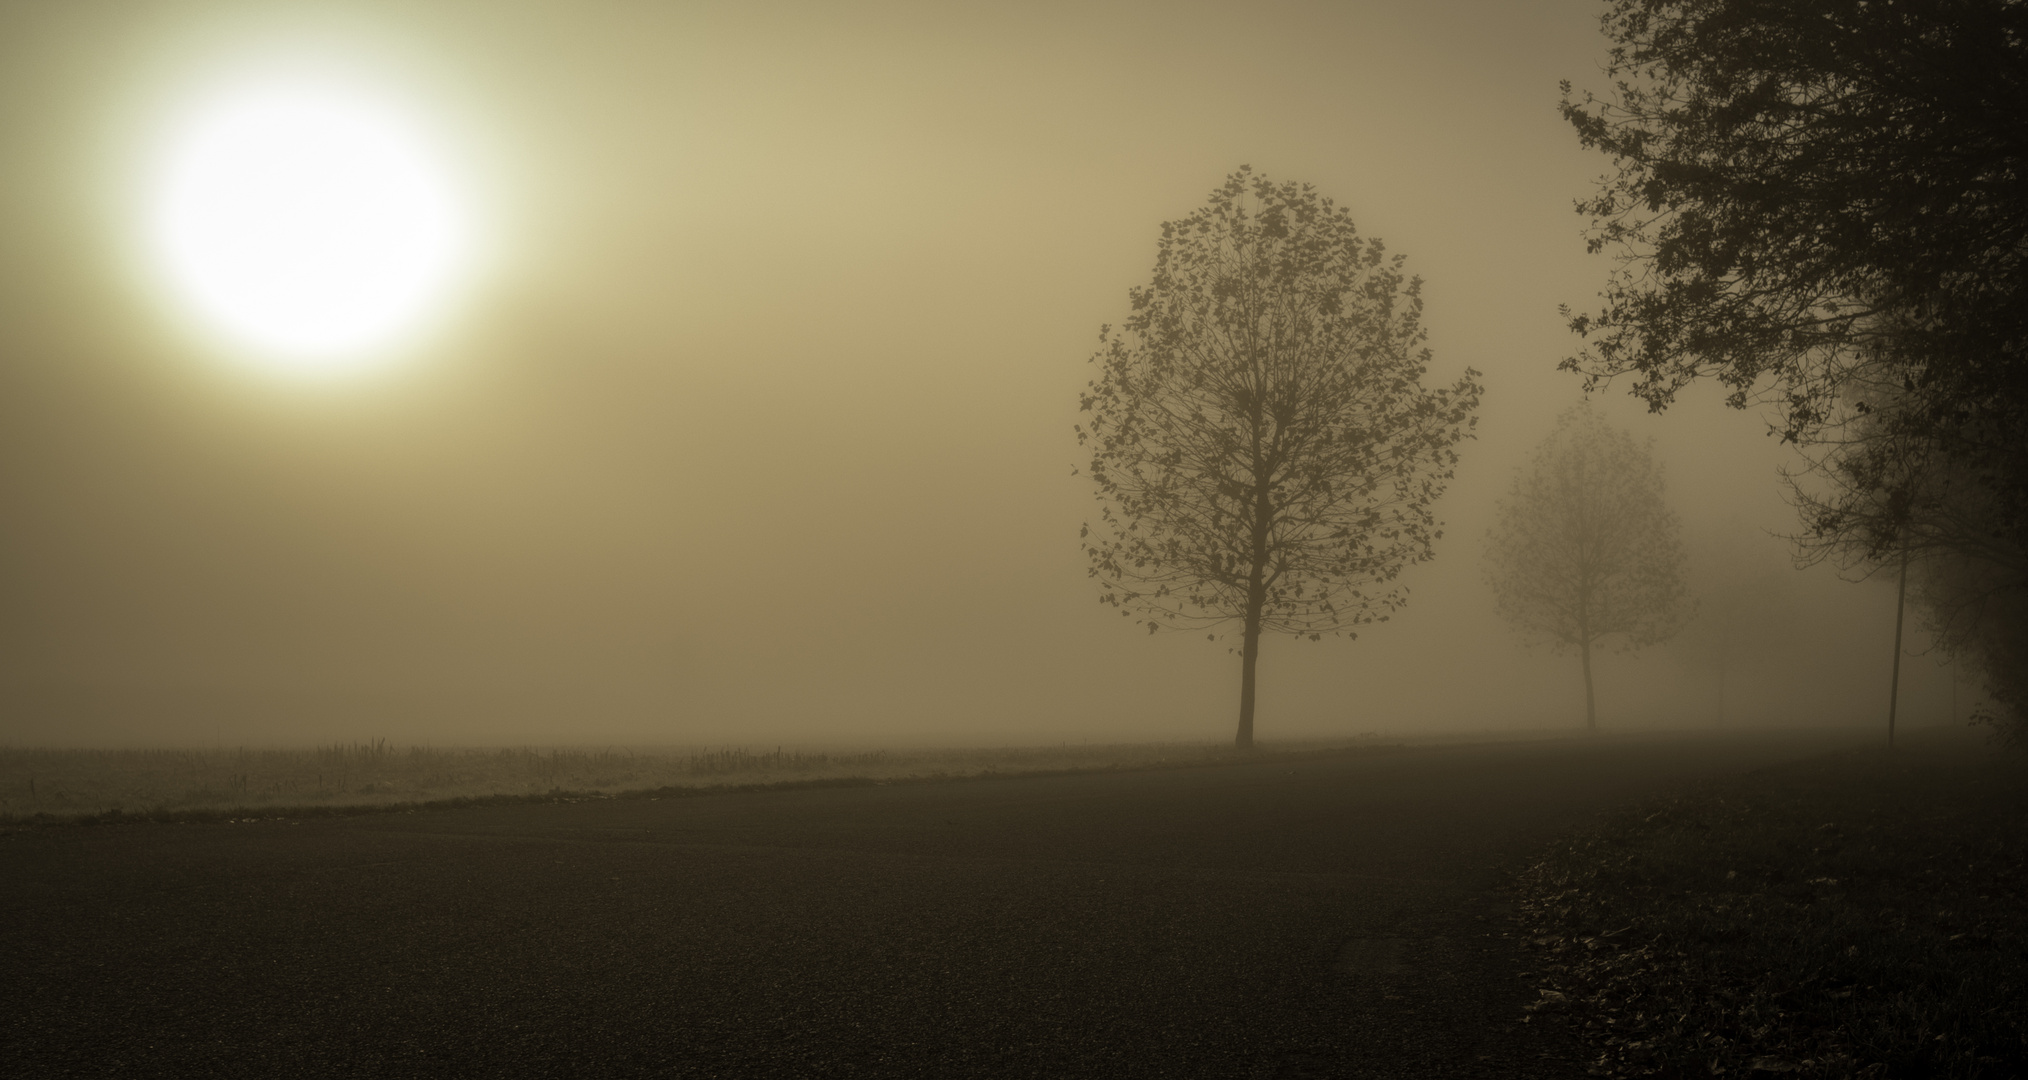 Près de Strasbourg, ce matin...